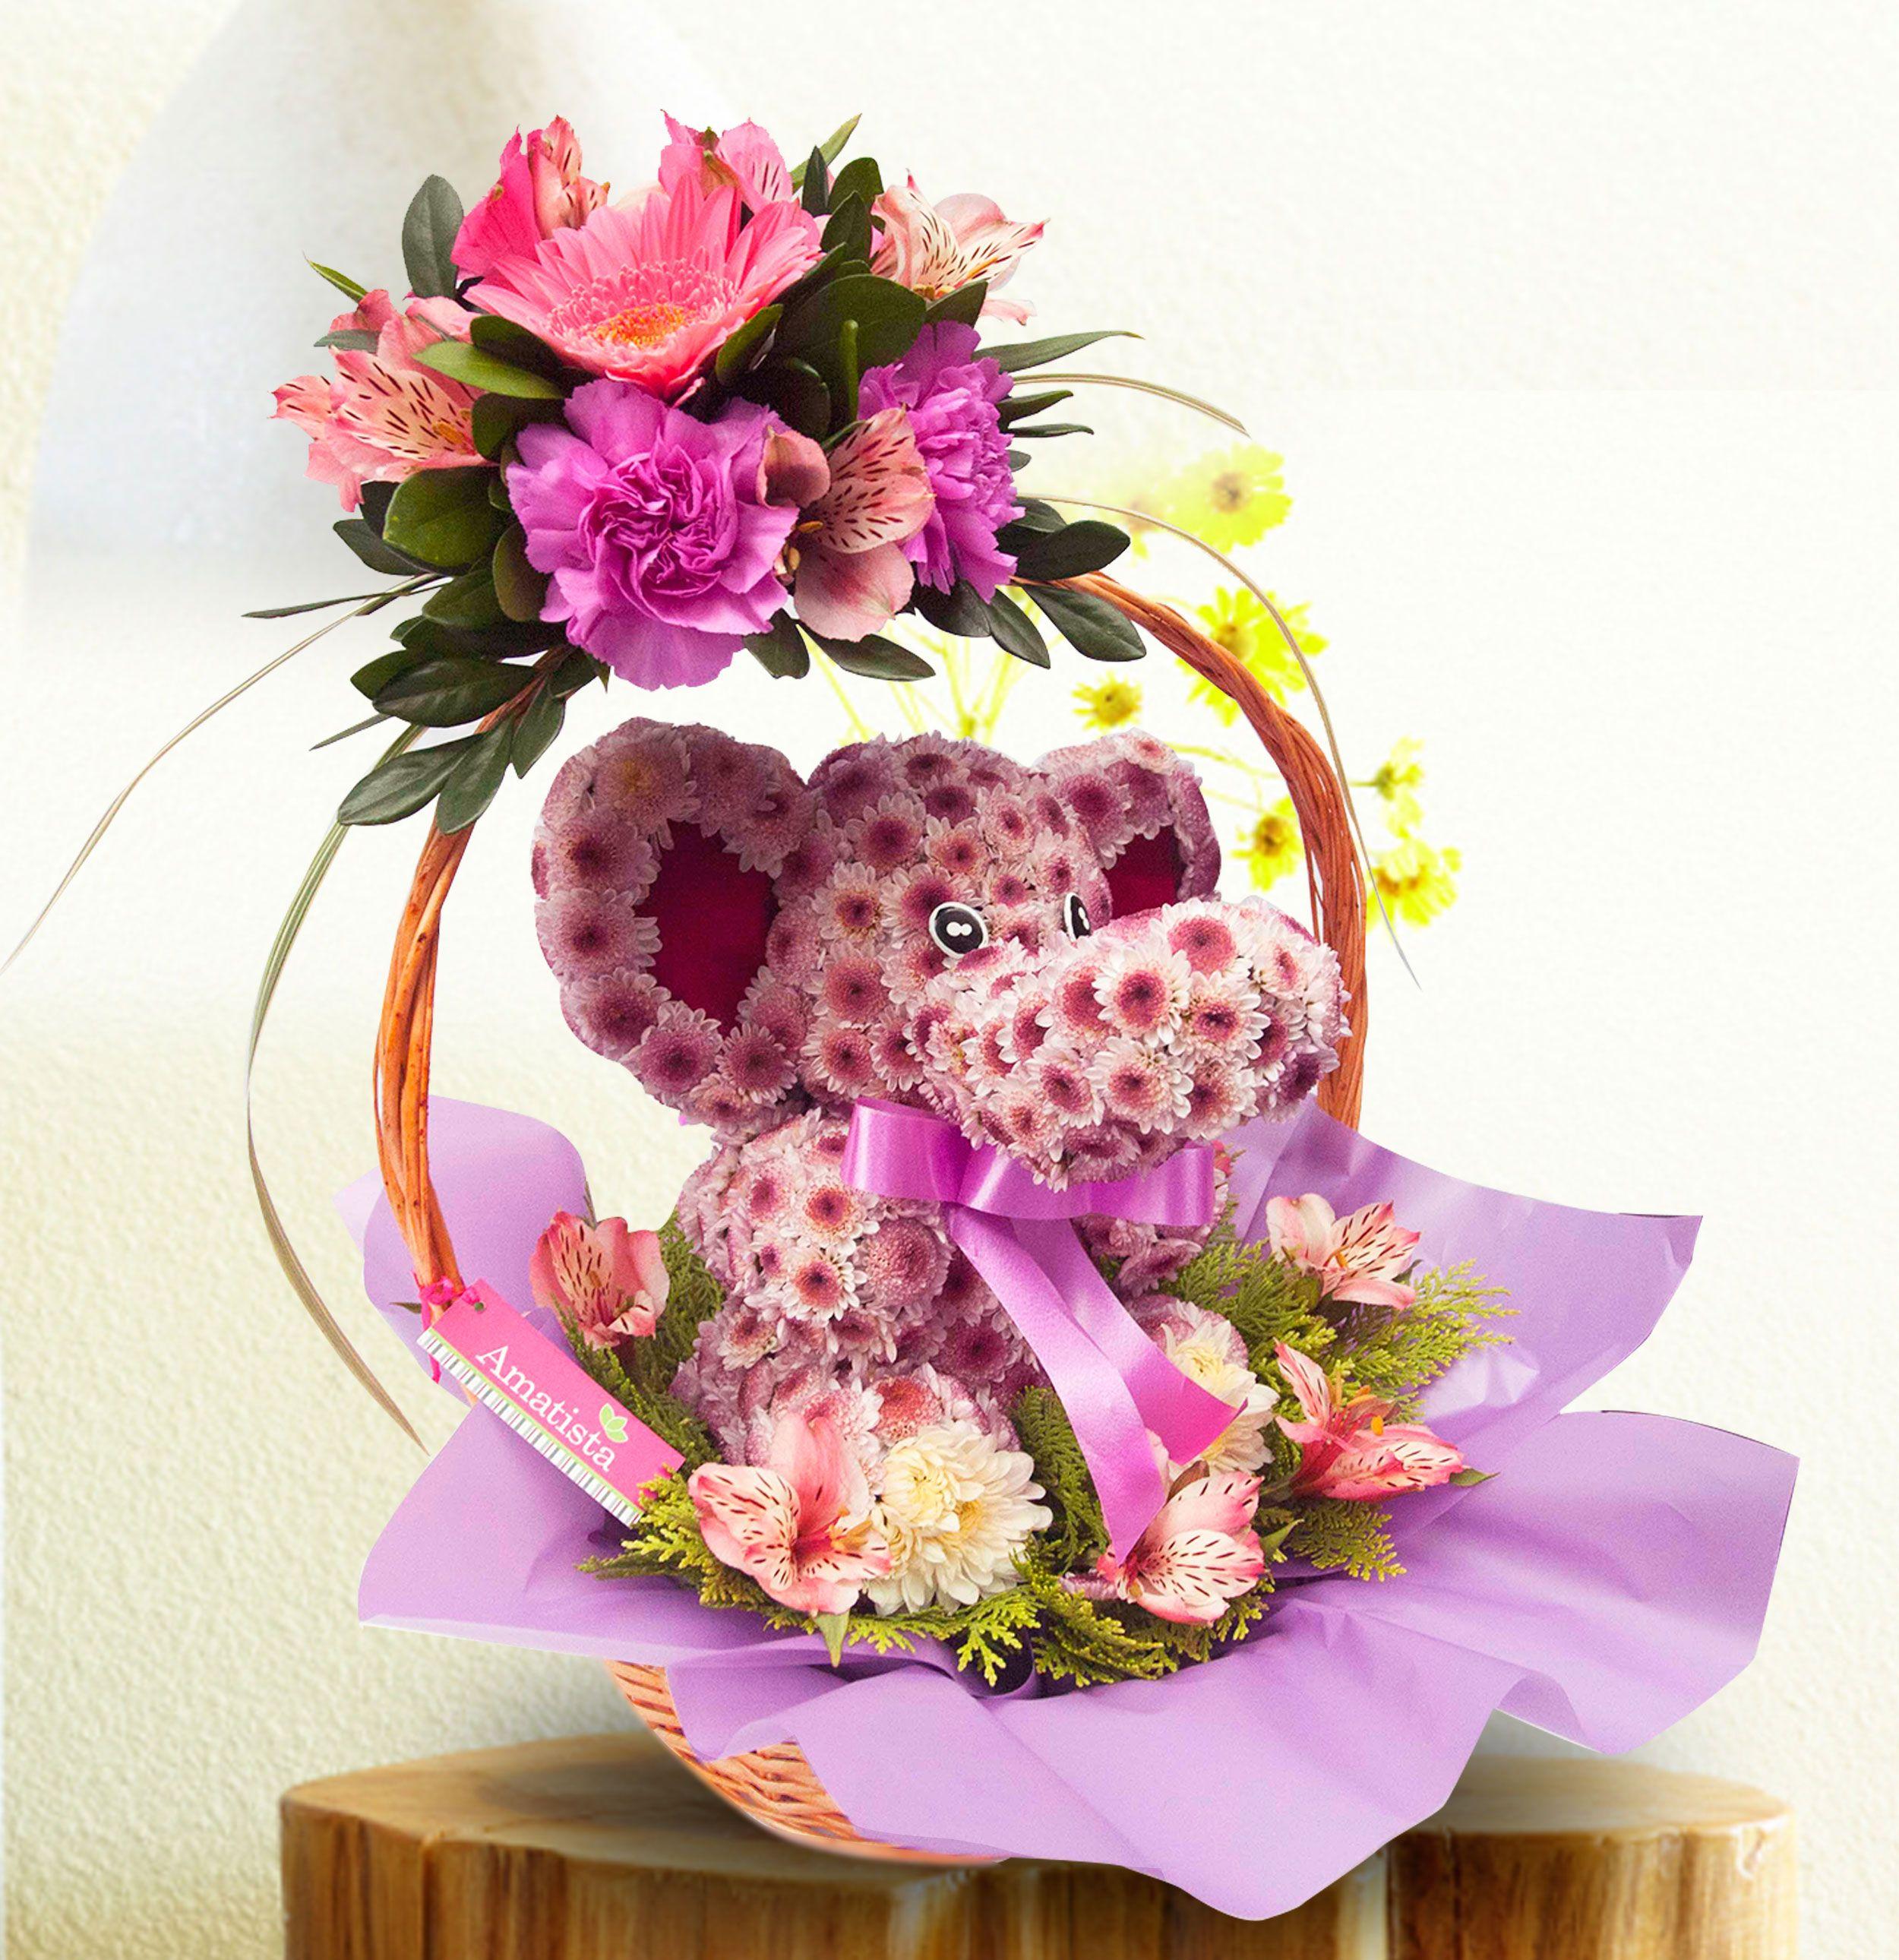 Lindo Mascota Floral Diseño Elefante Con Flores Perfumadas